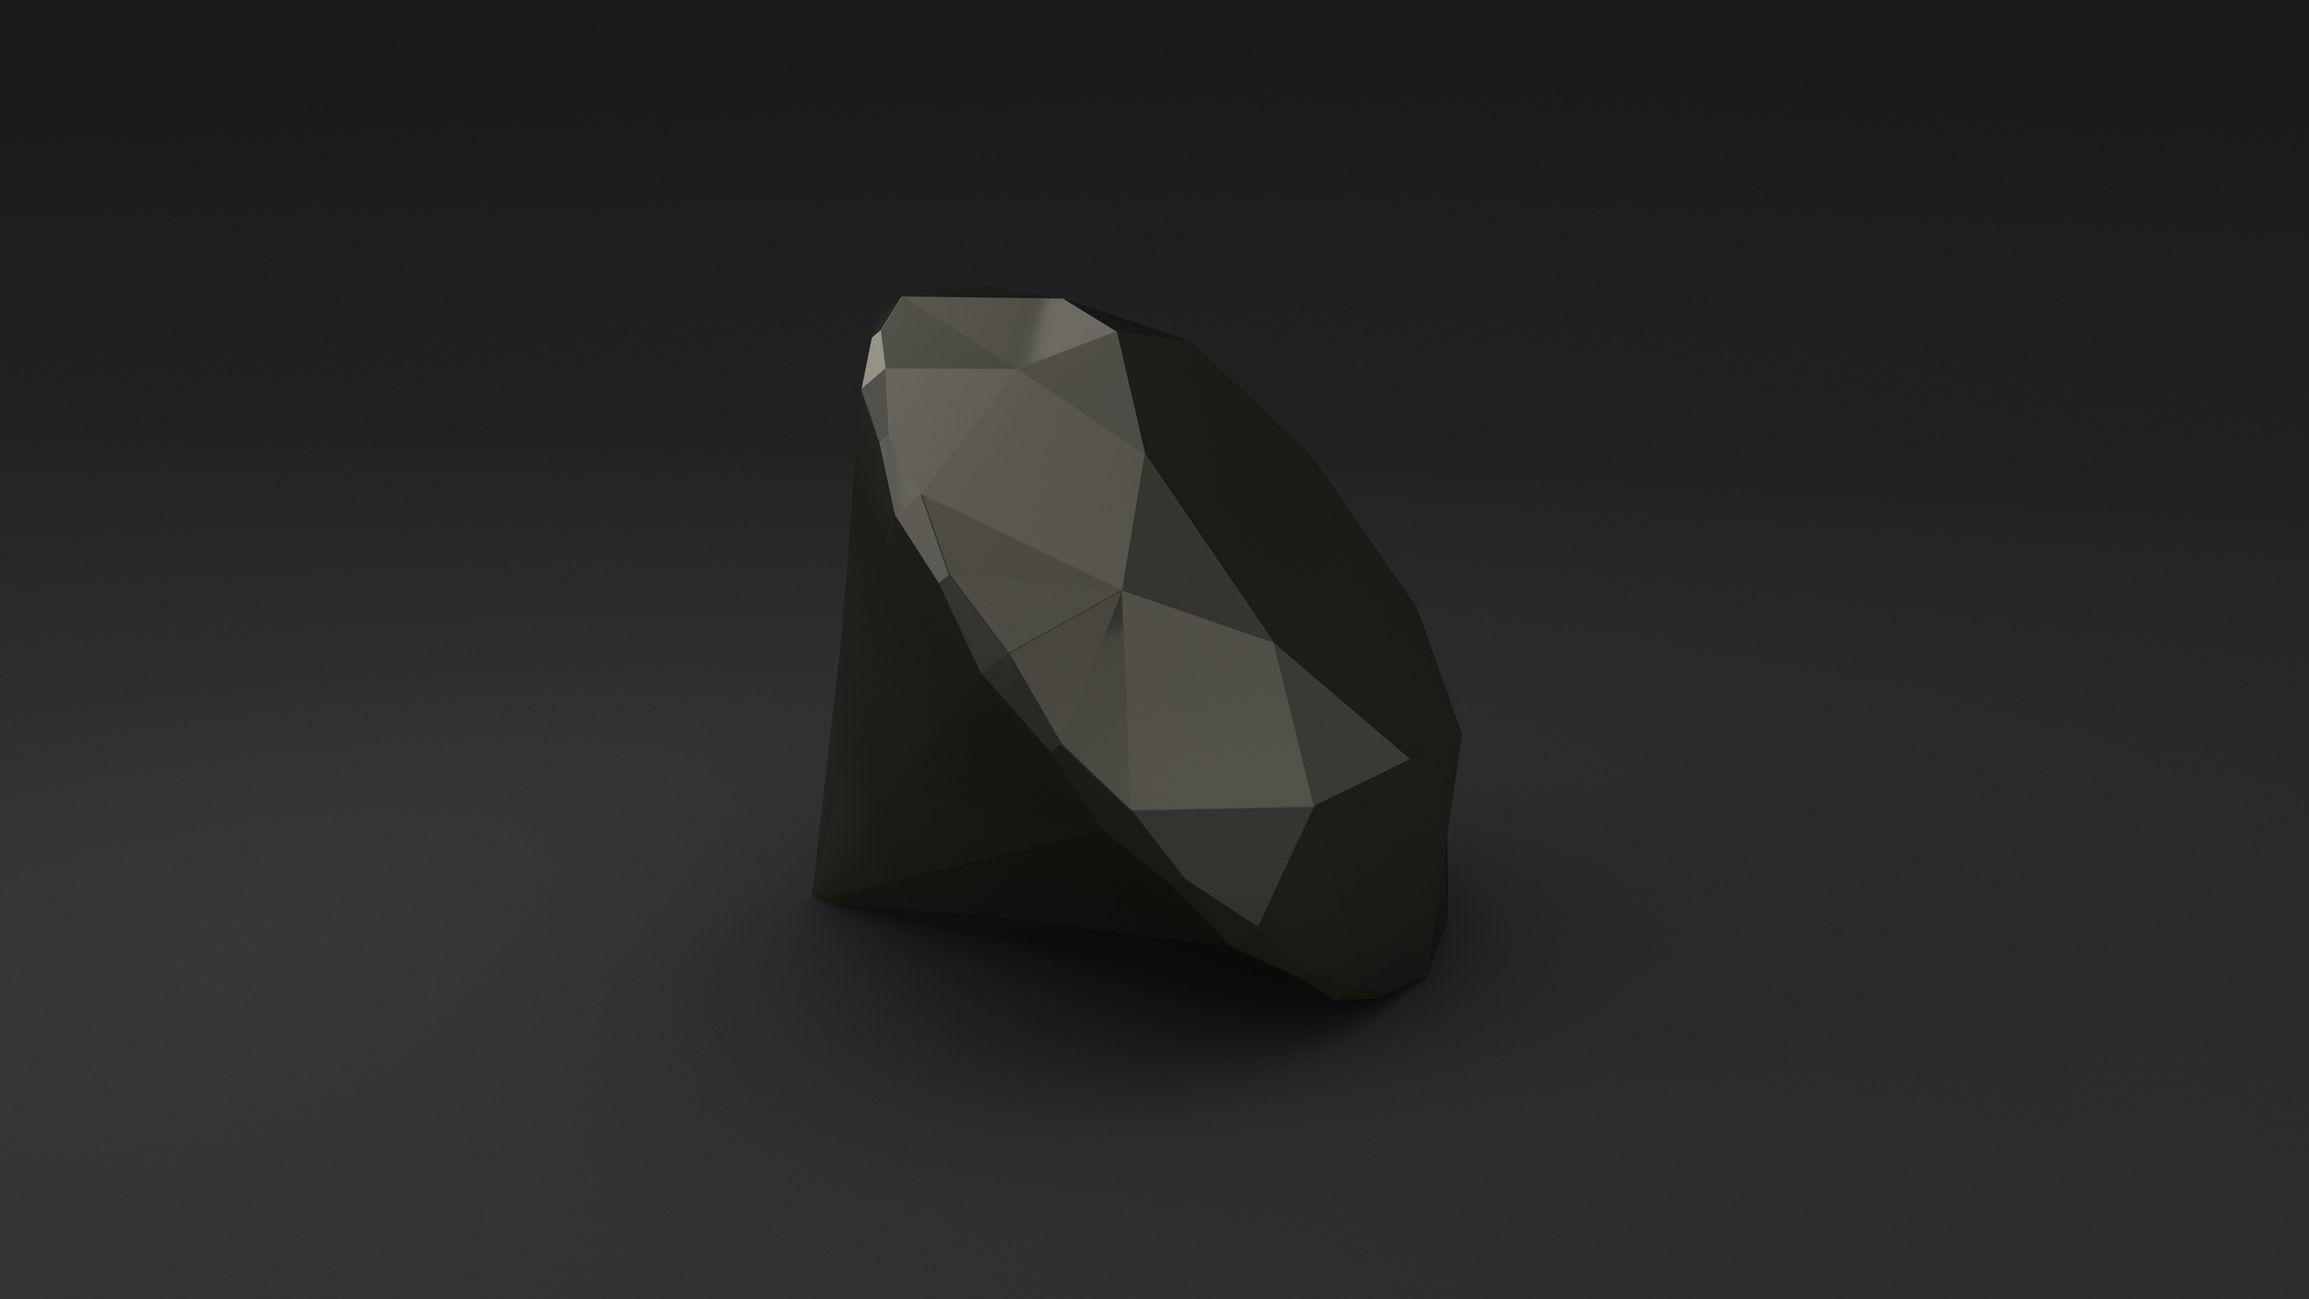 Polished black diamond on a black background